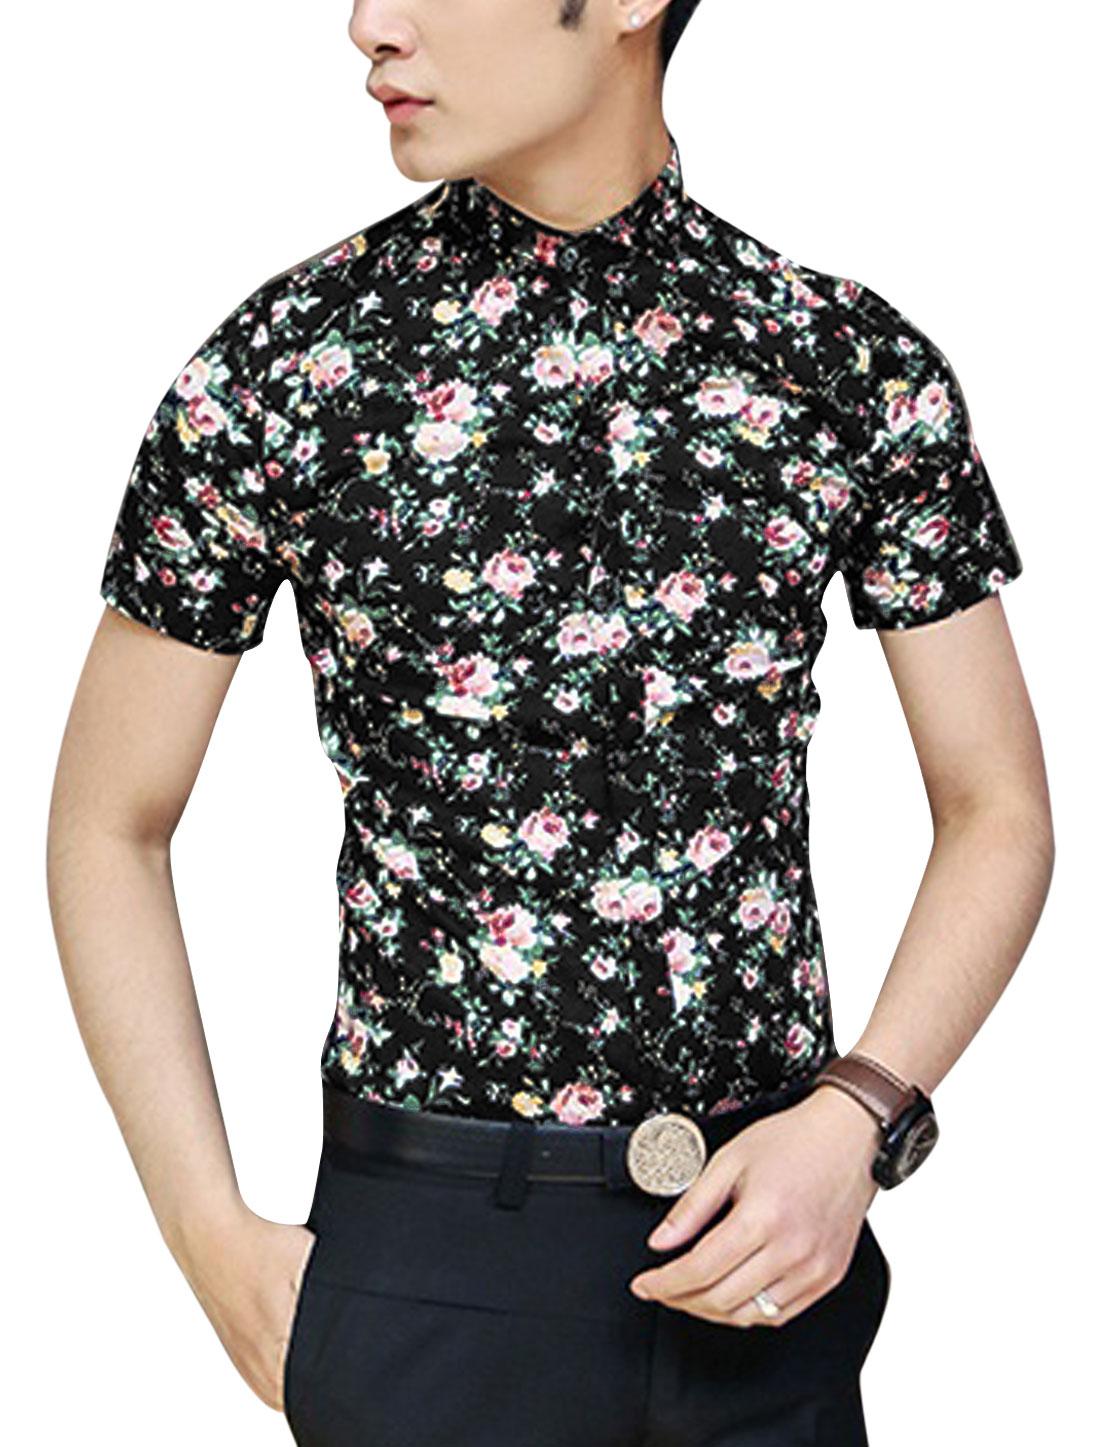 Men Point Collar Short Sleeve Button Down Floral Prints Summer Shirt Black S